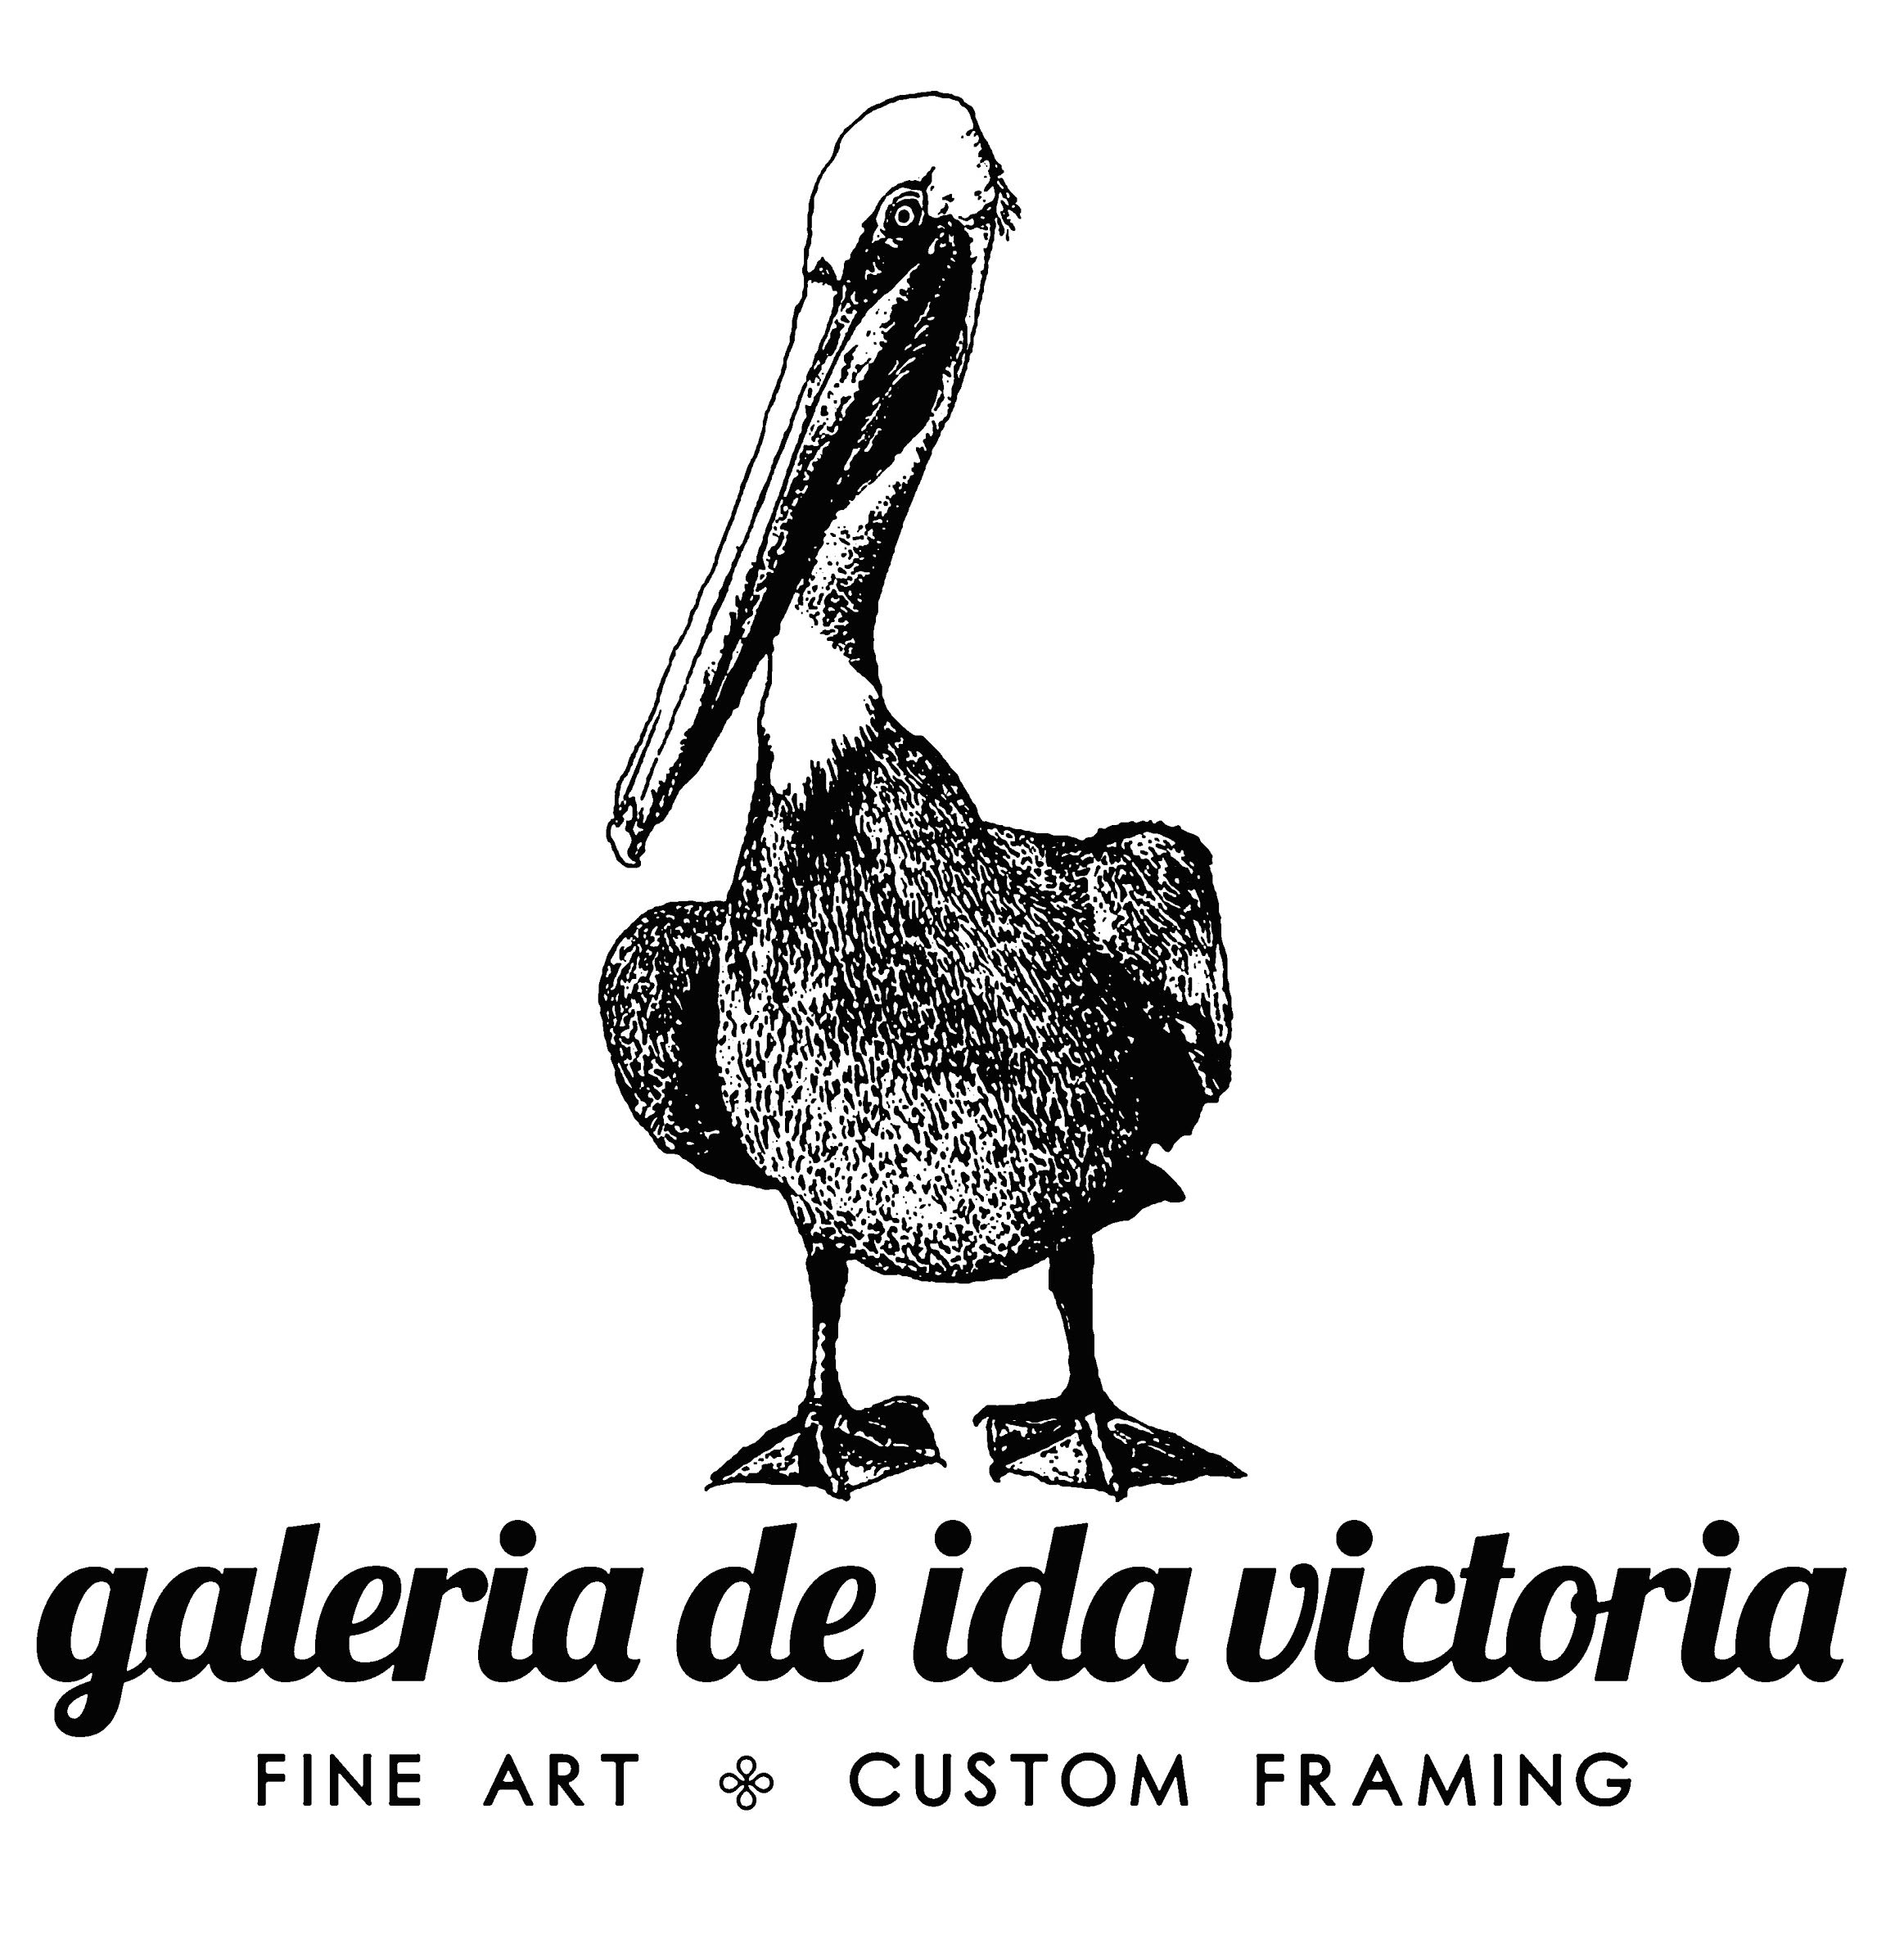 Galeria de Ida Victoria